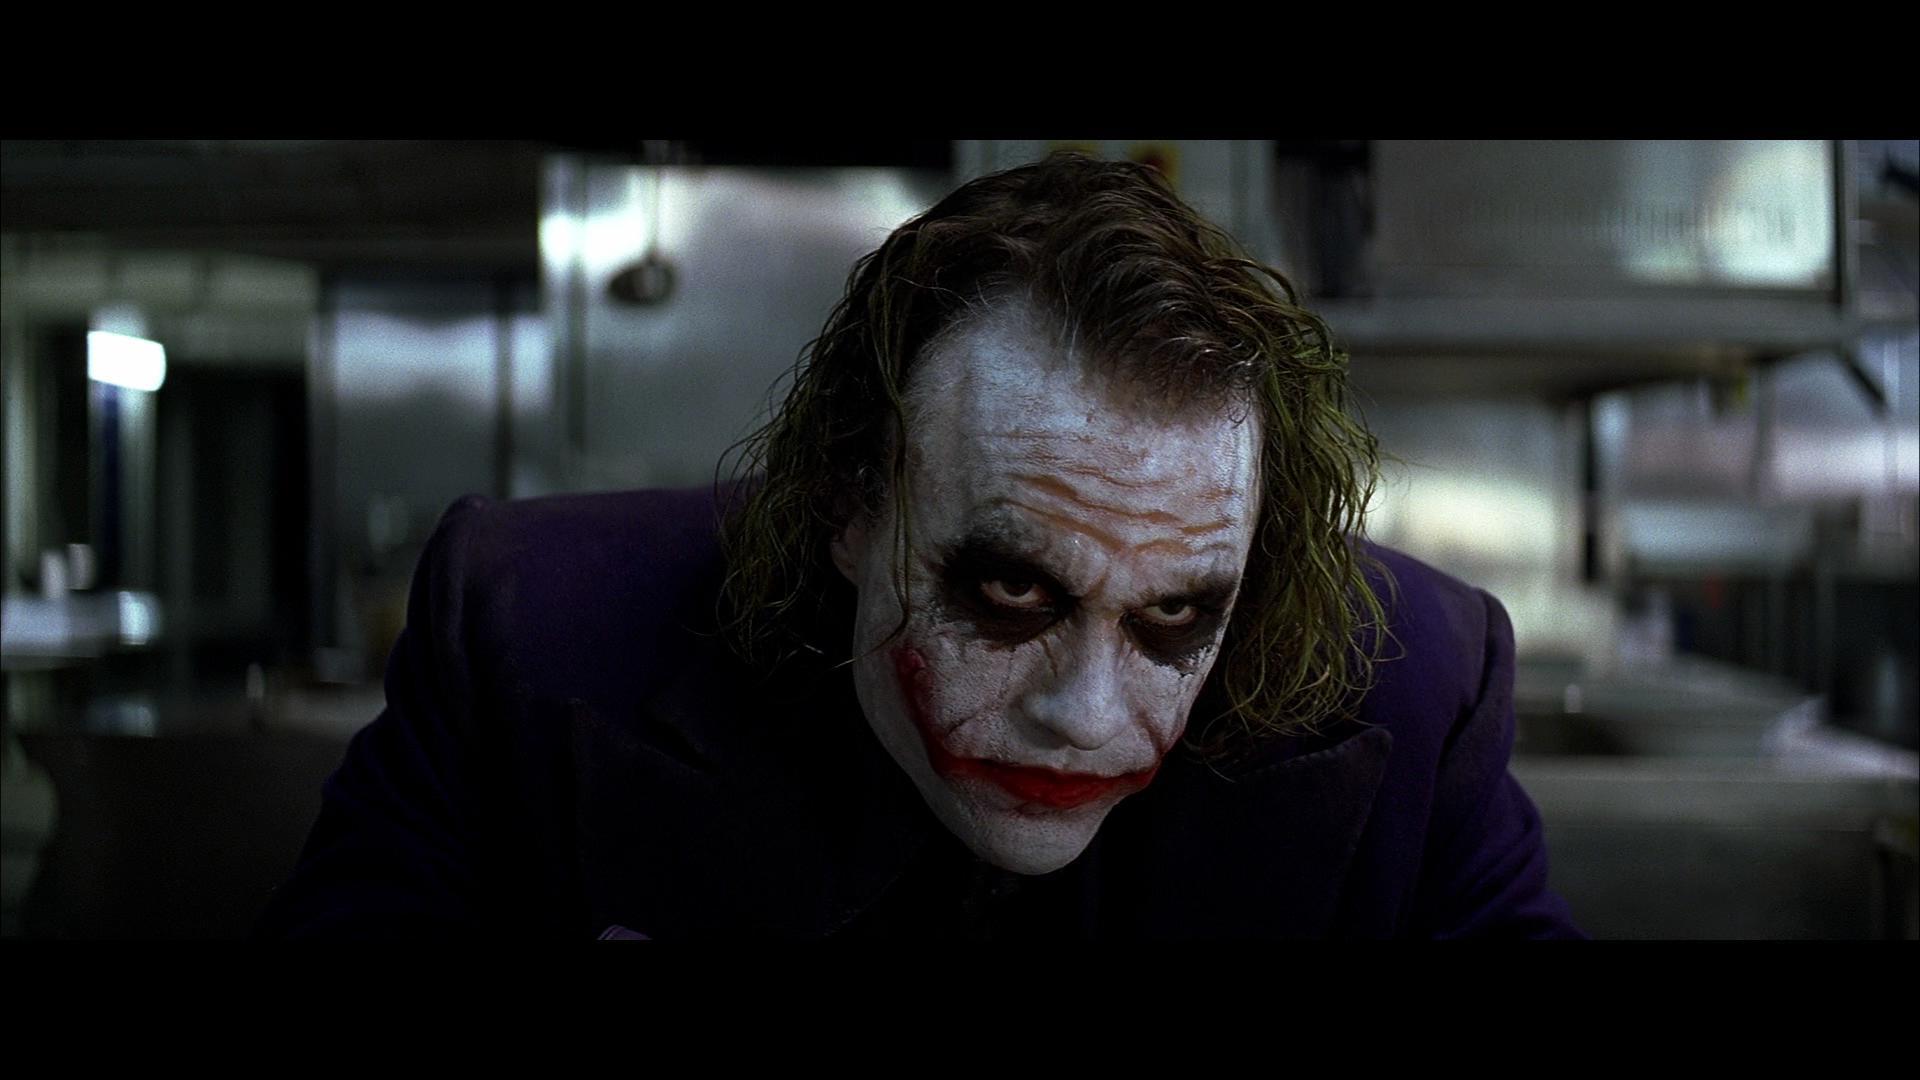 35200 download wallpaper Cinema, Actors, Men, Joker screensavers and pictures for free